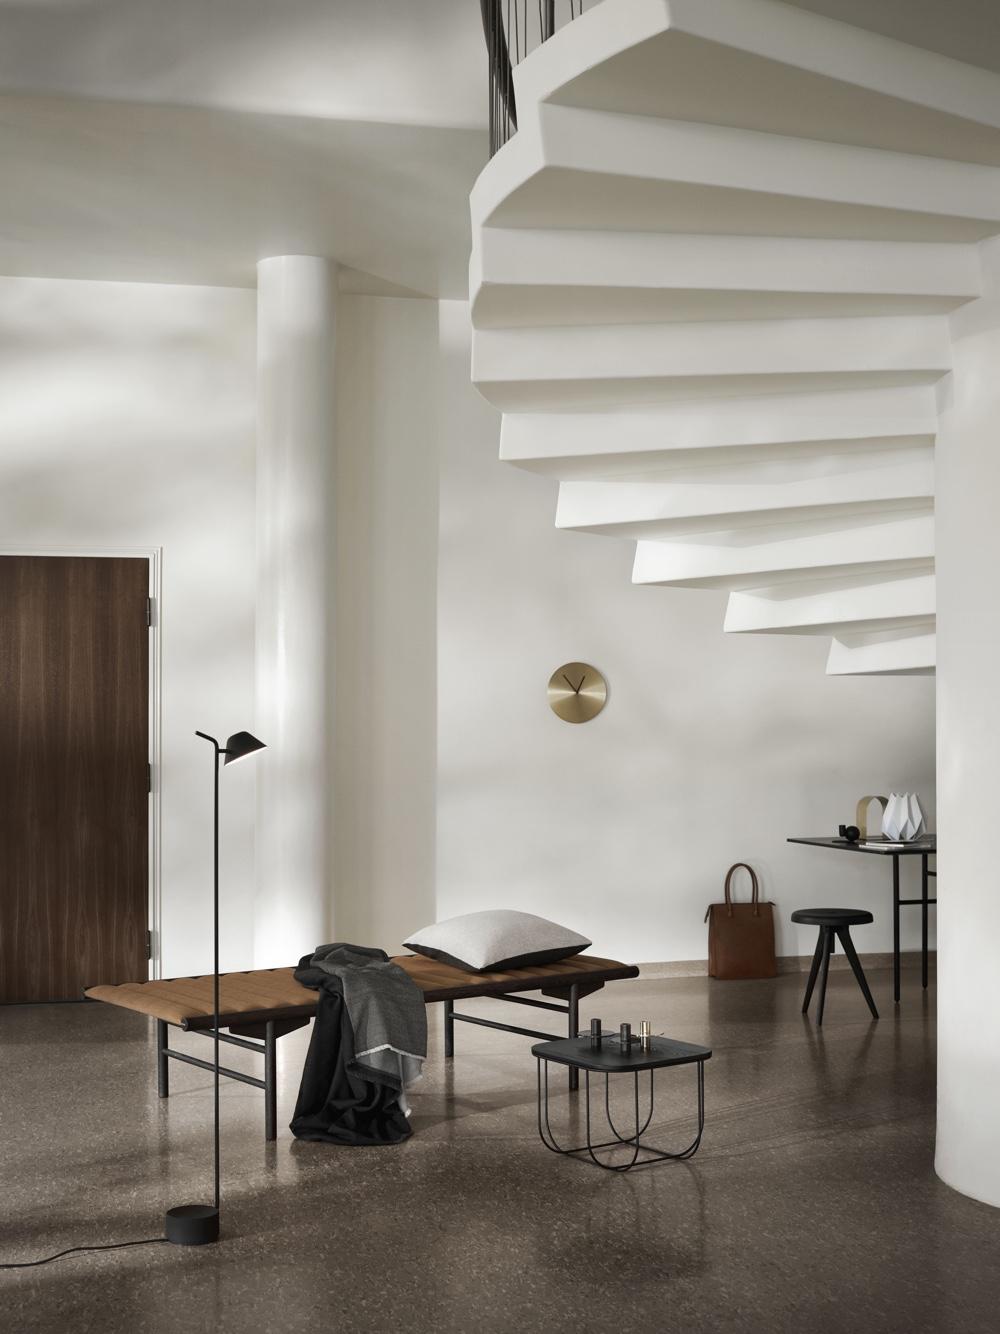 Принципы модернизма - под лестницей